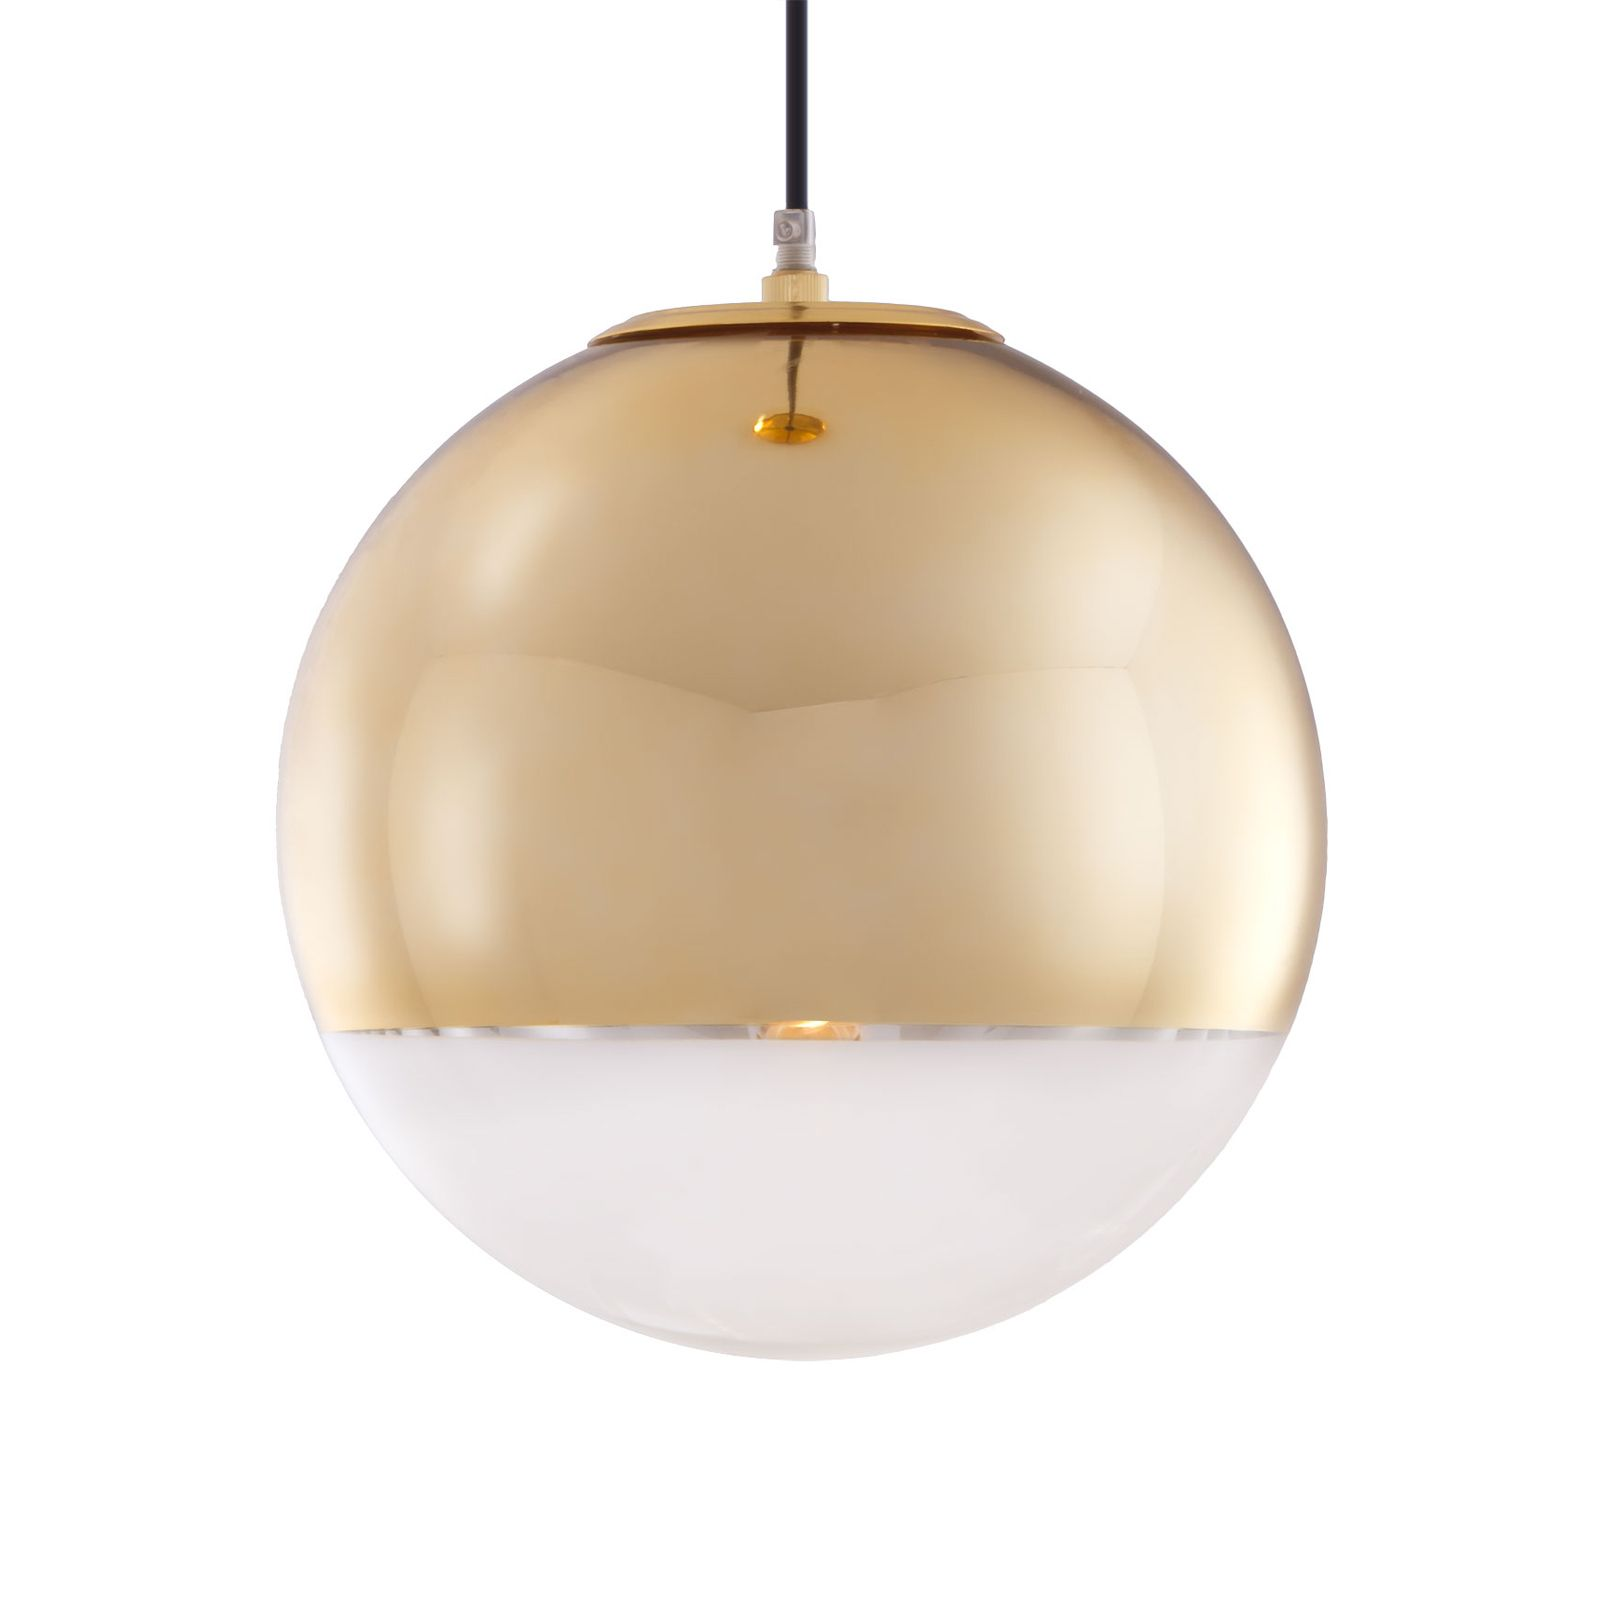 Hanging Light Spheres: Sphere Pendant Lamp Http://dotandbo.com/collections